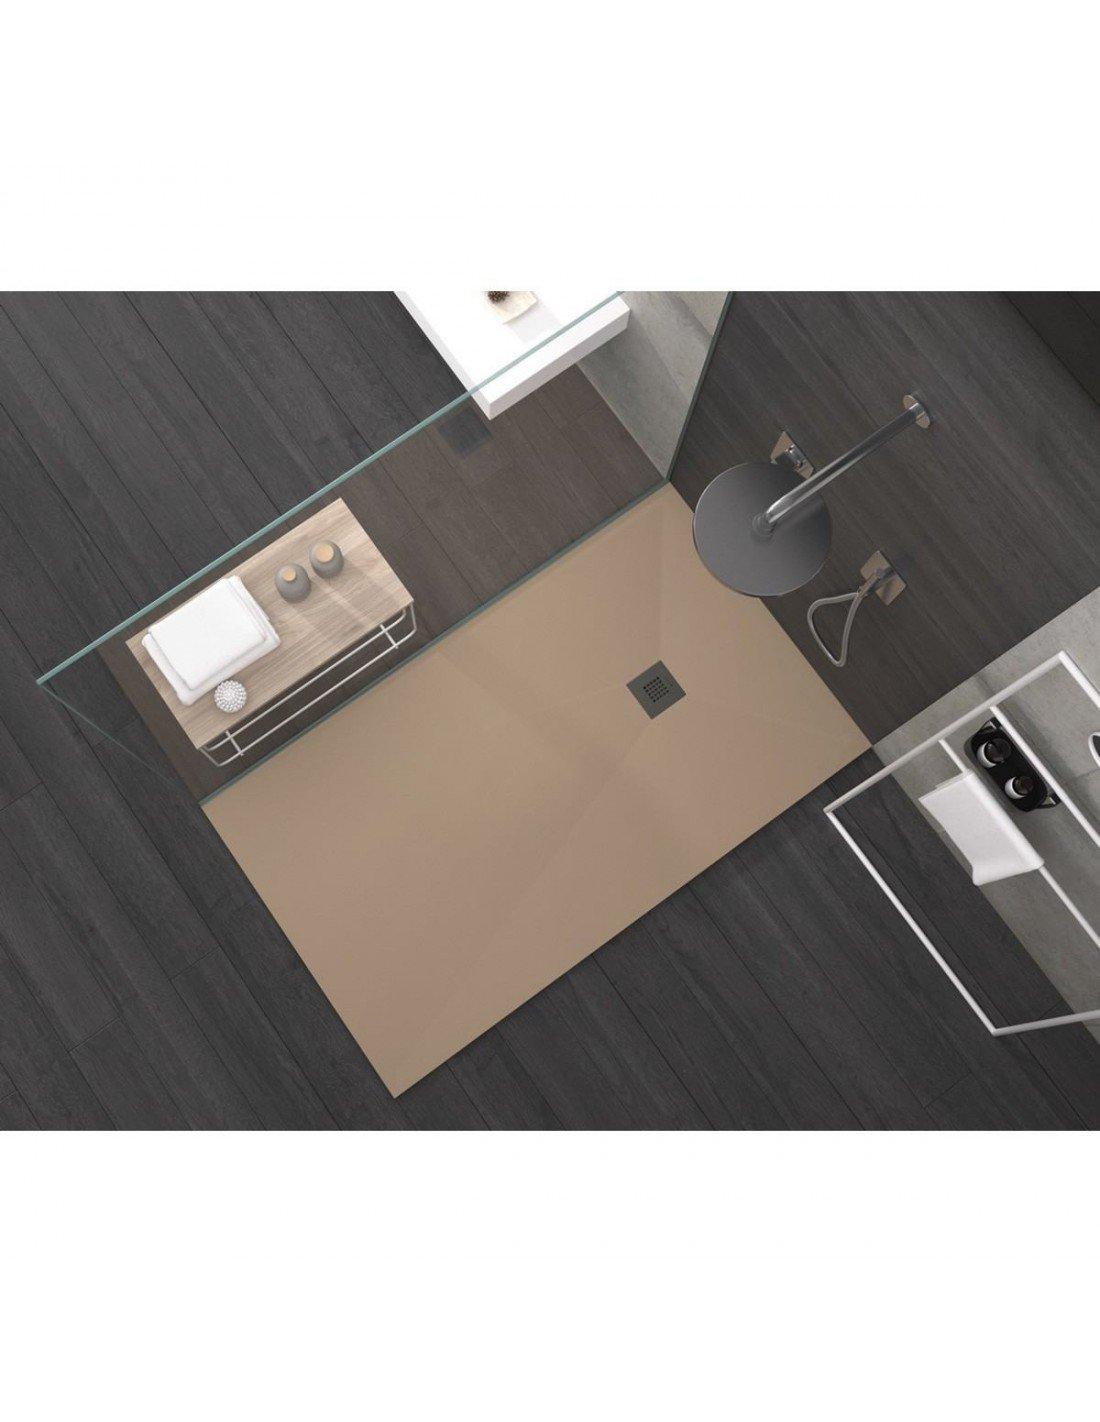 Mm X Mm Wet Room Tray